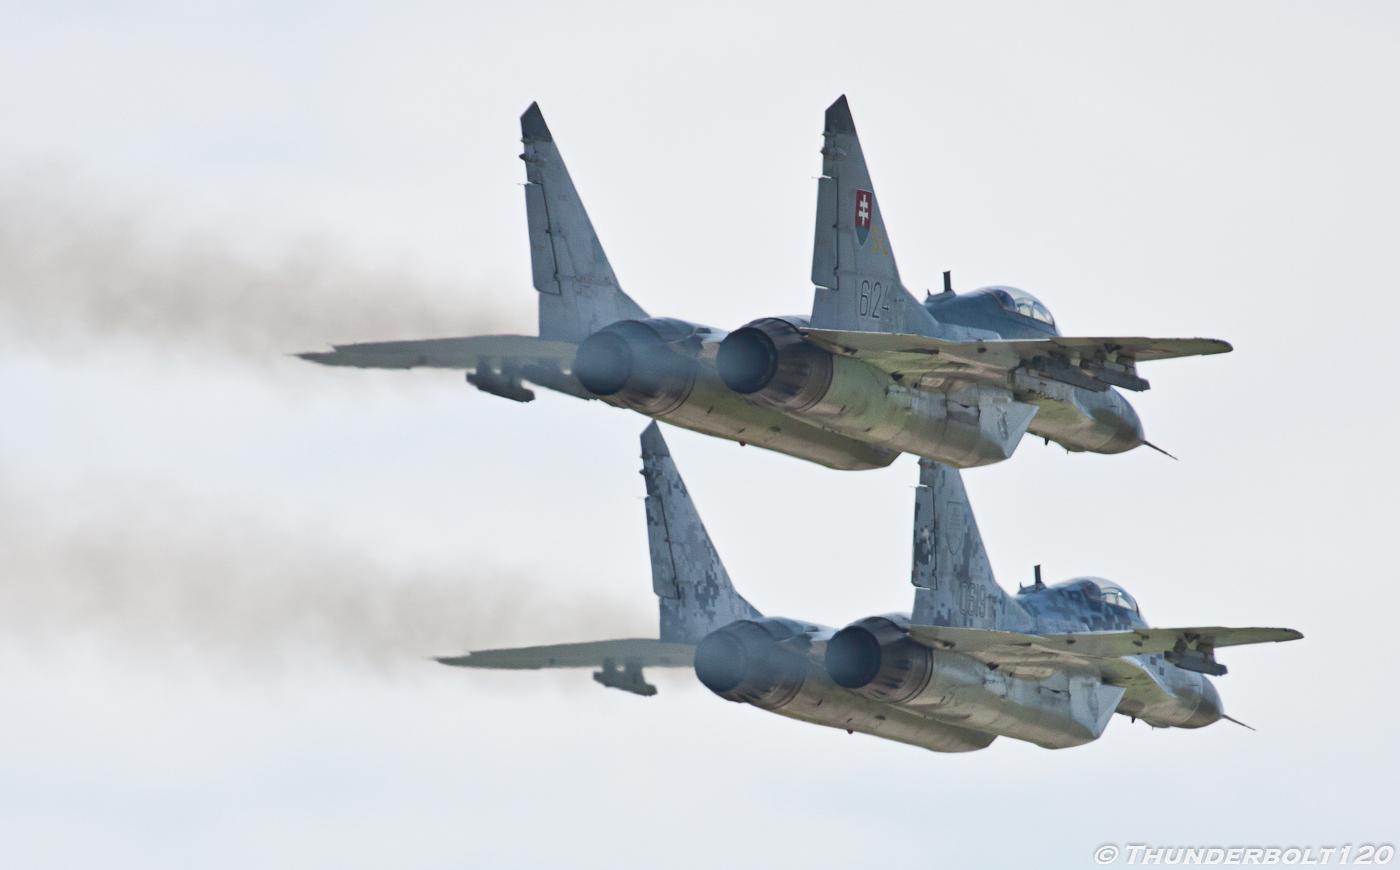 2x Mig-29